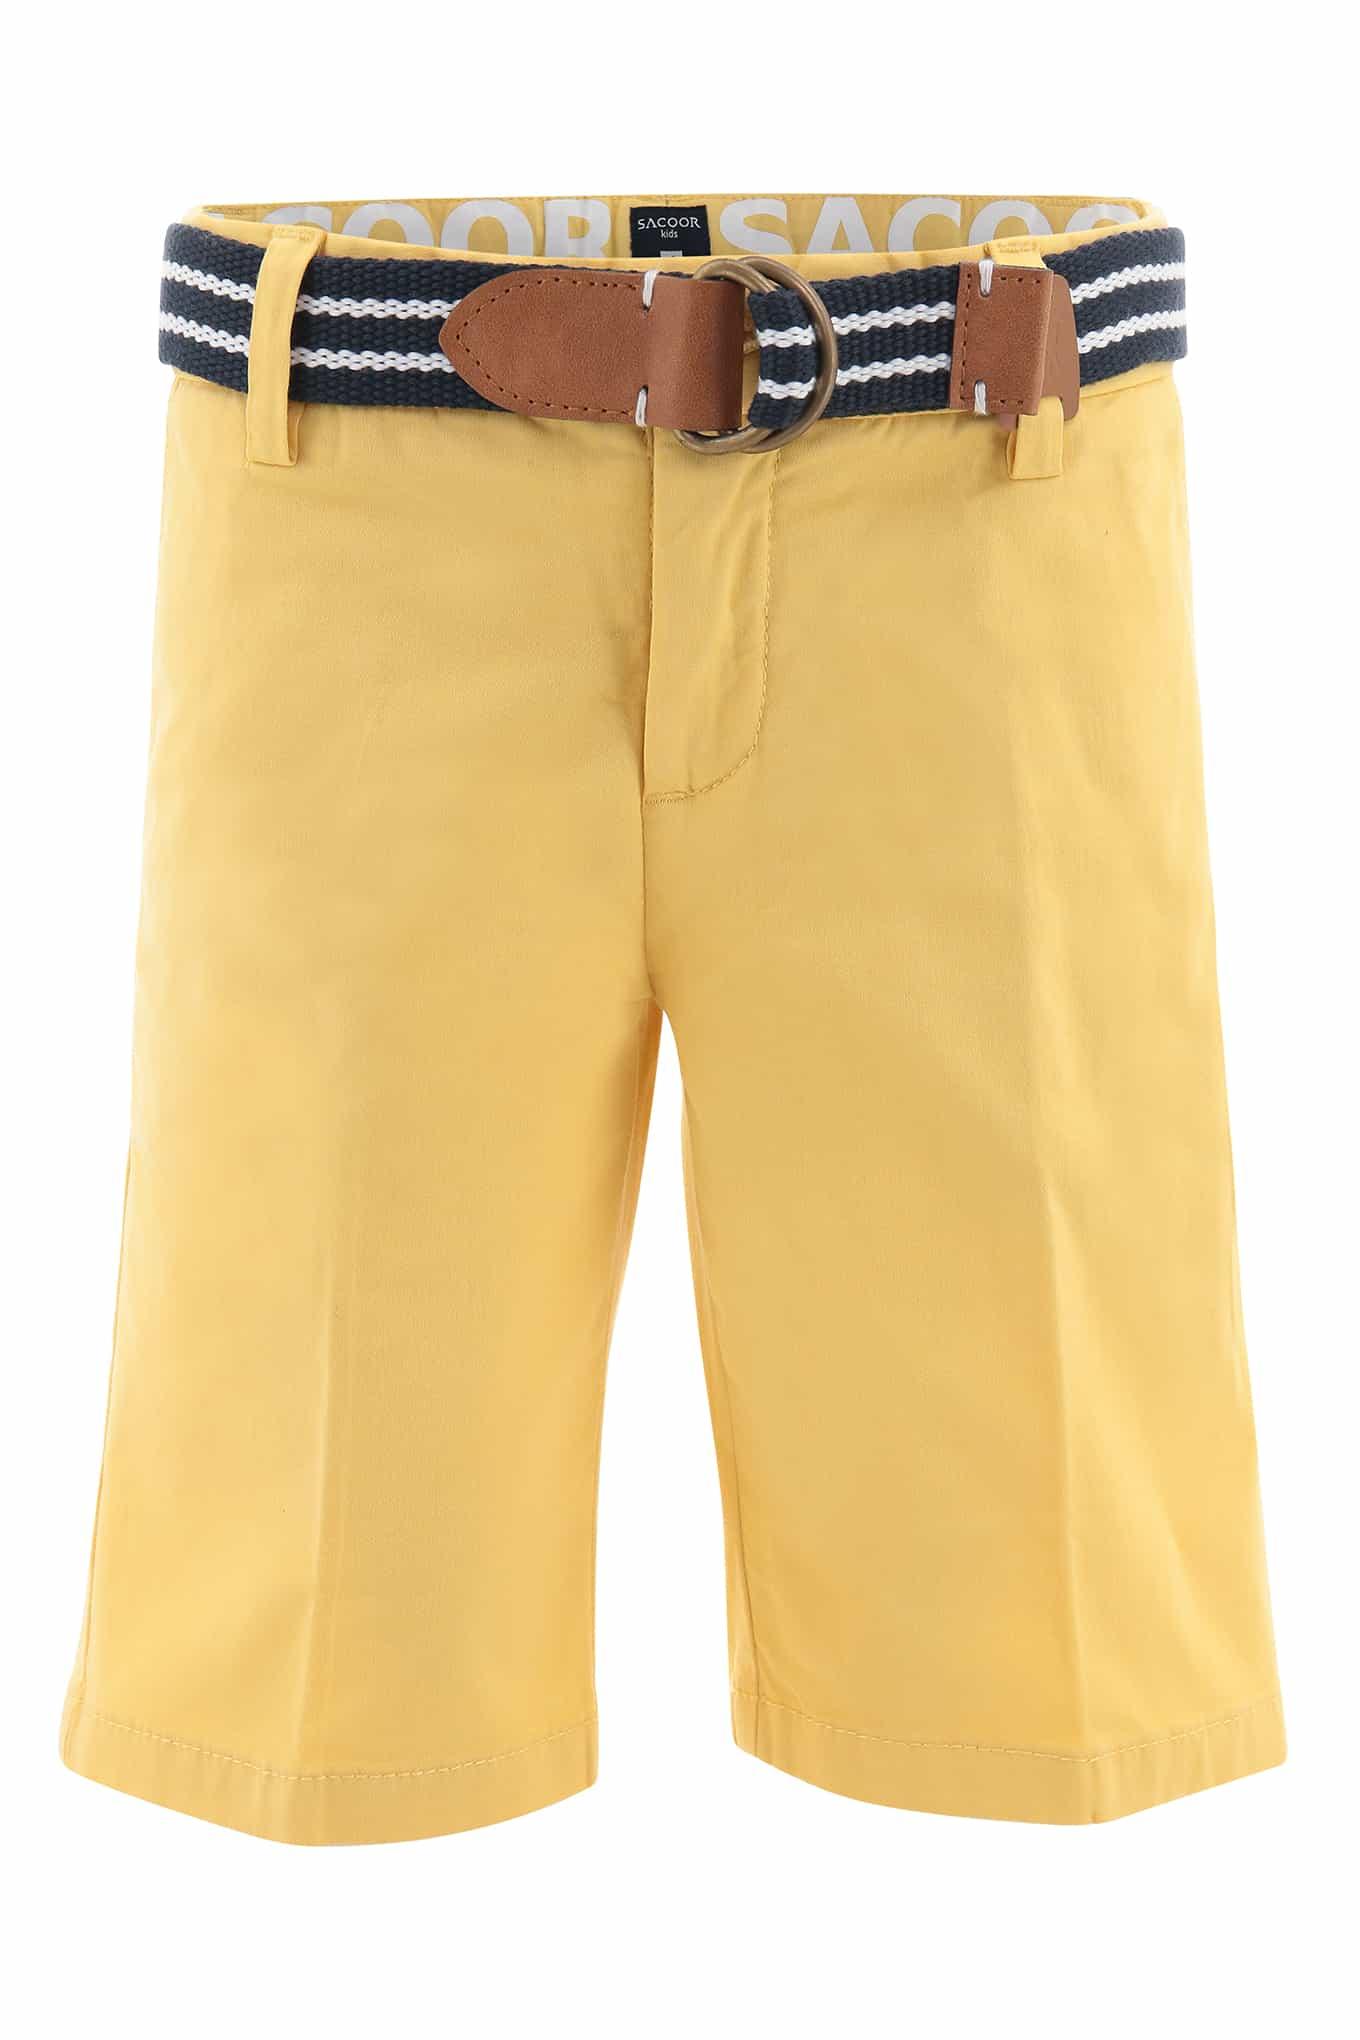 Bermuda Light Yellow Sport Boy